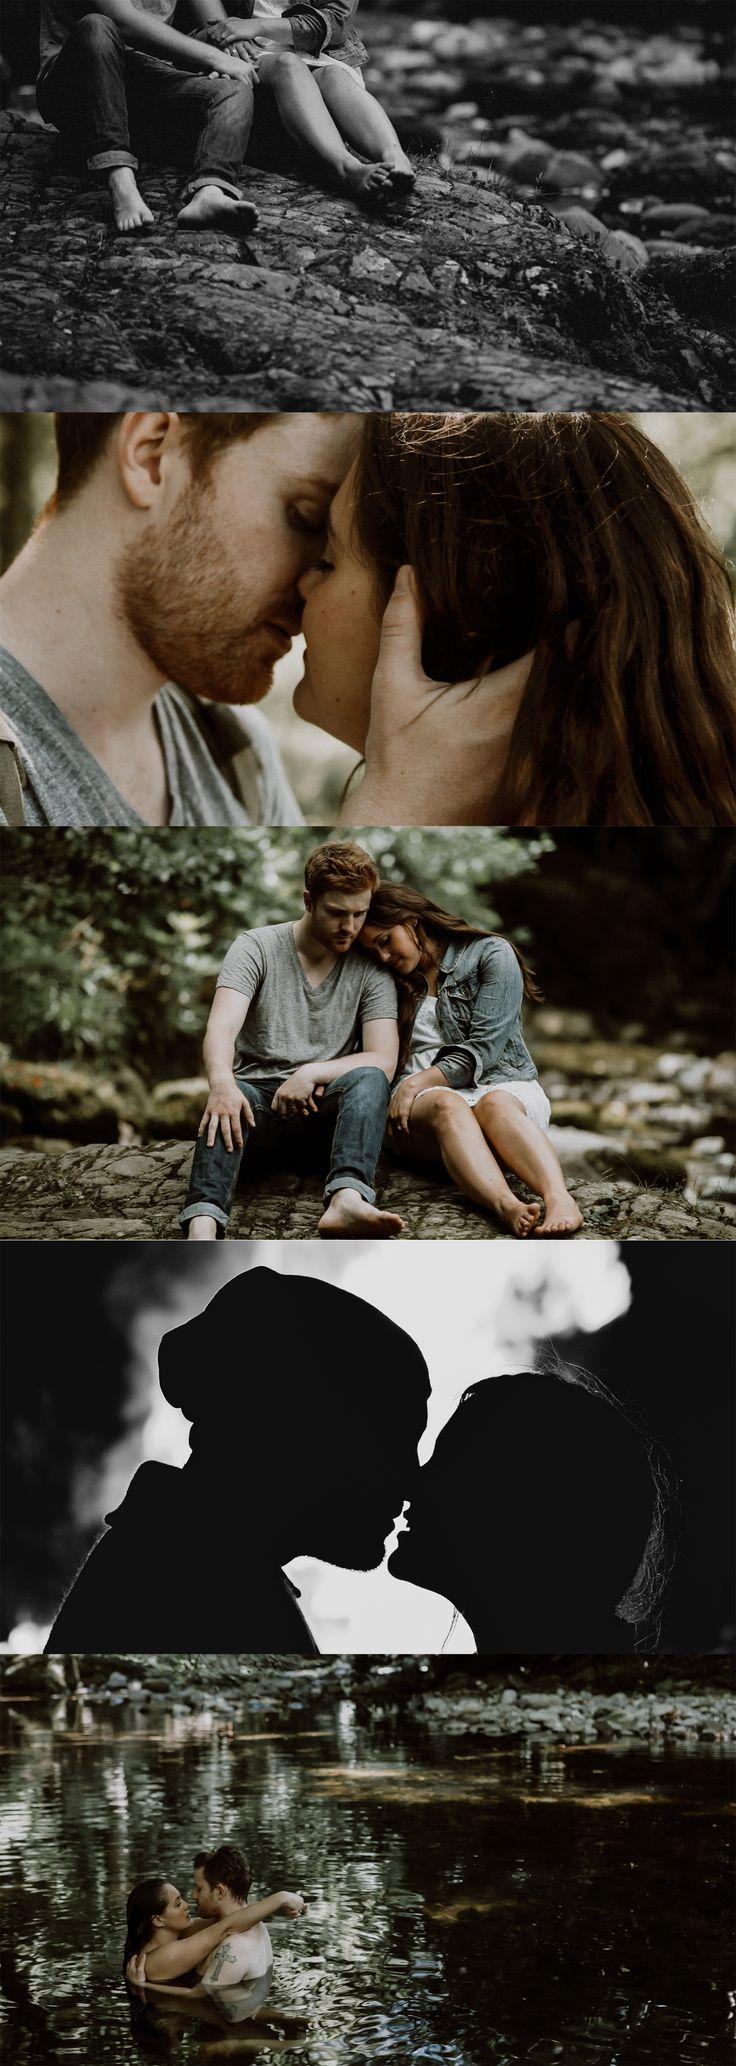 Couple camping in the woods.  #couples #couplegoals #wanderlust #wild #wildcamping #ireland